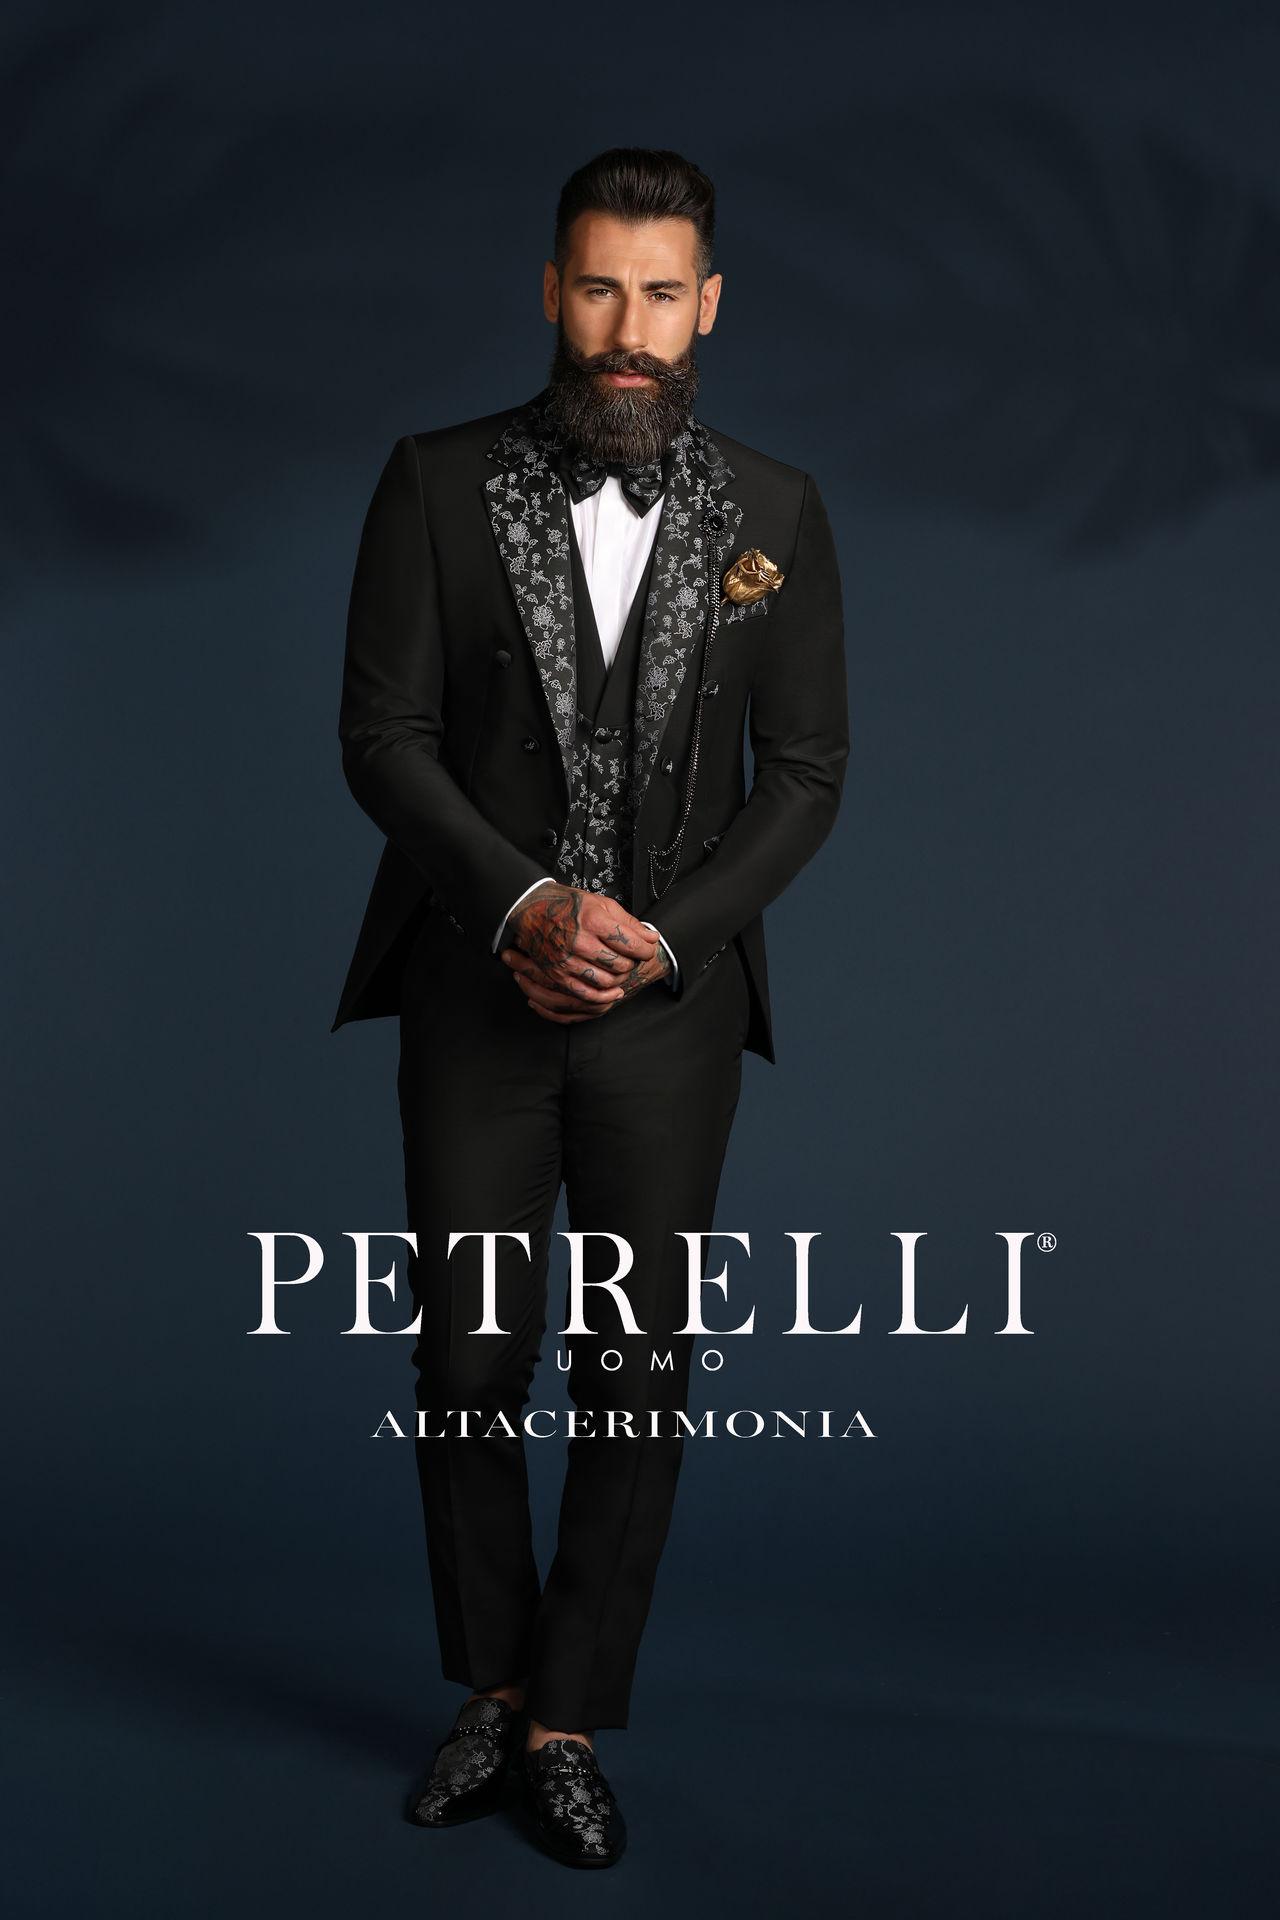 Petrelli